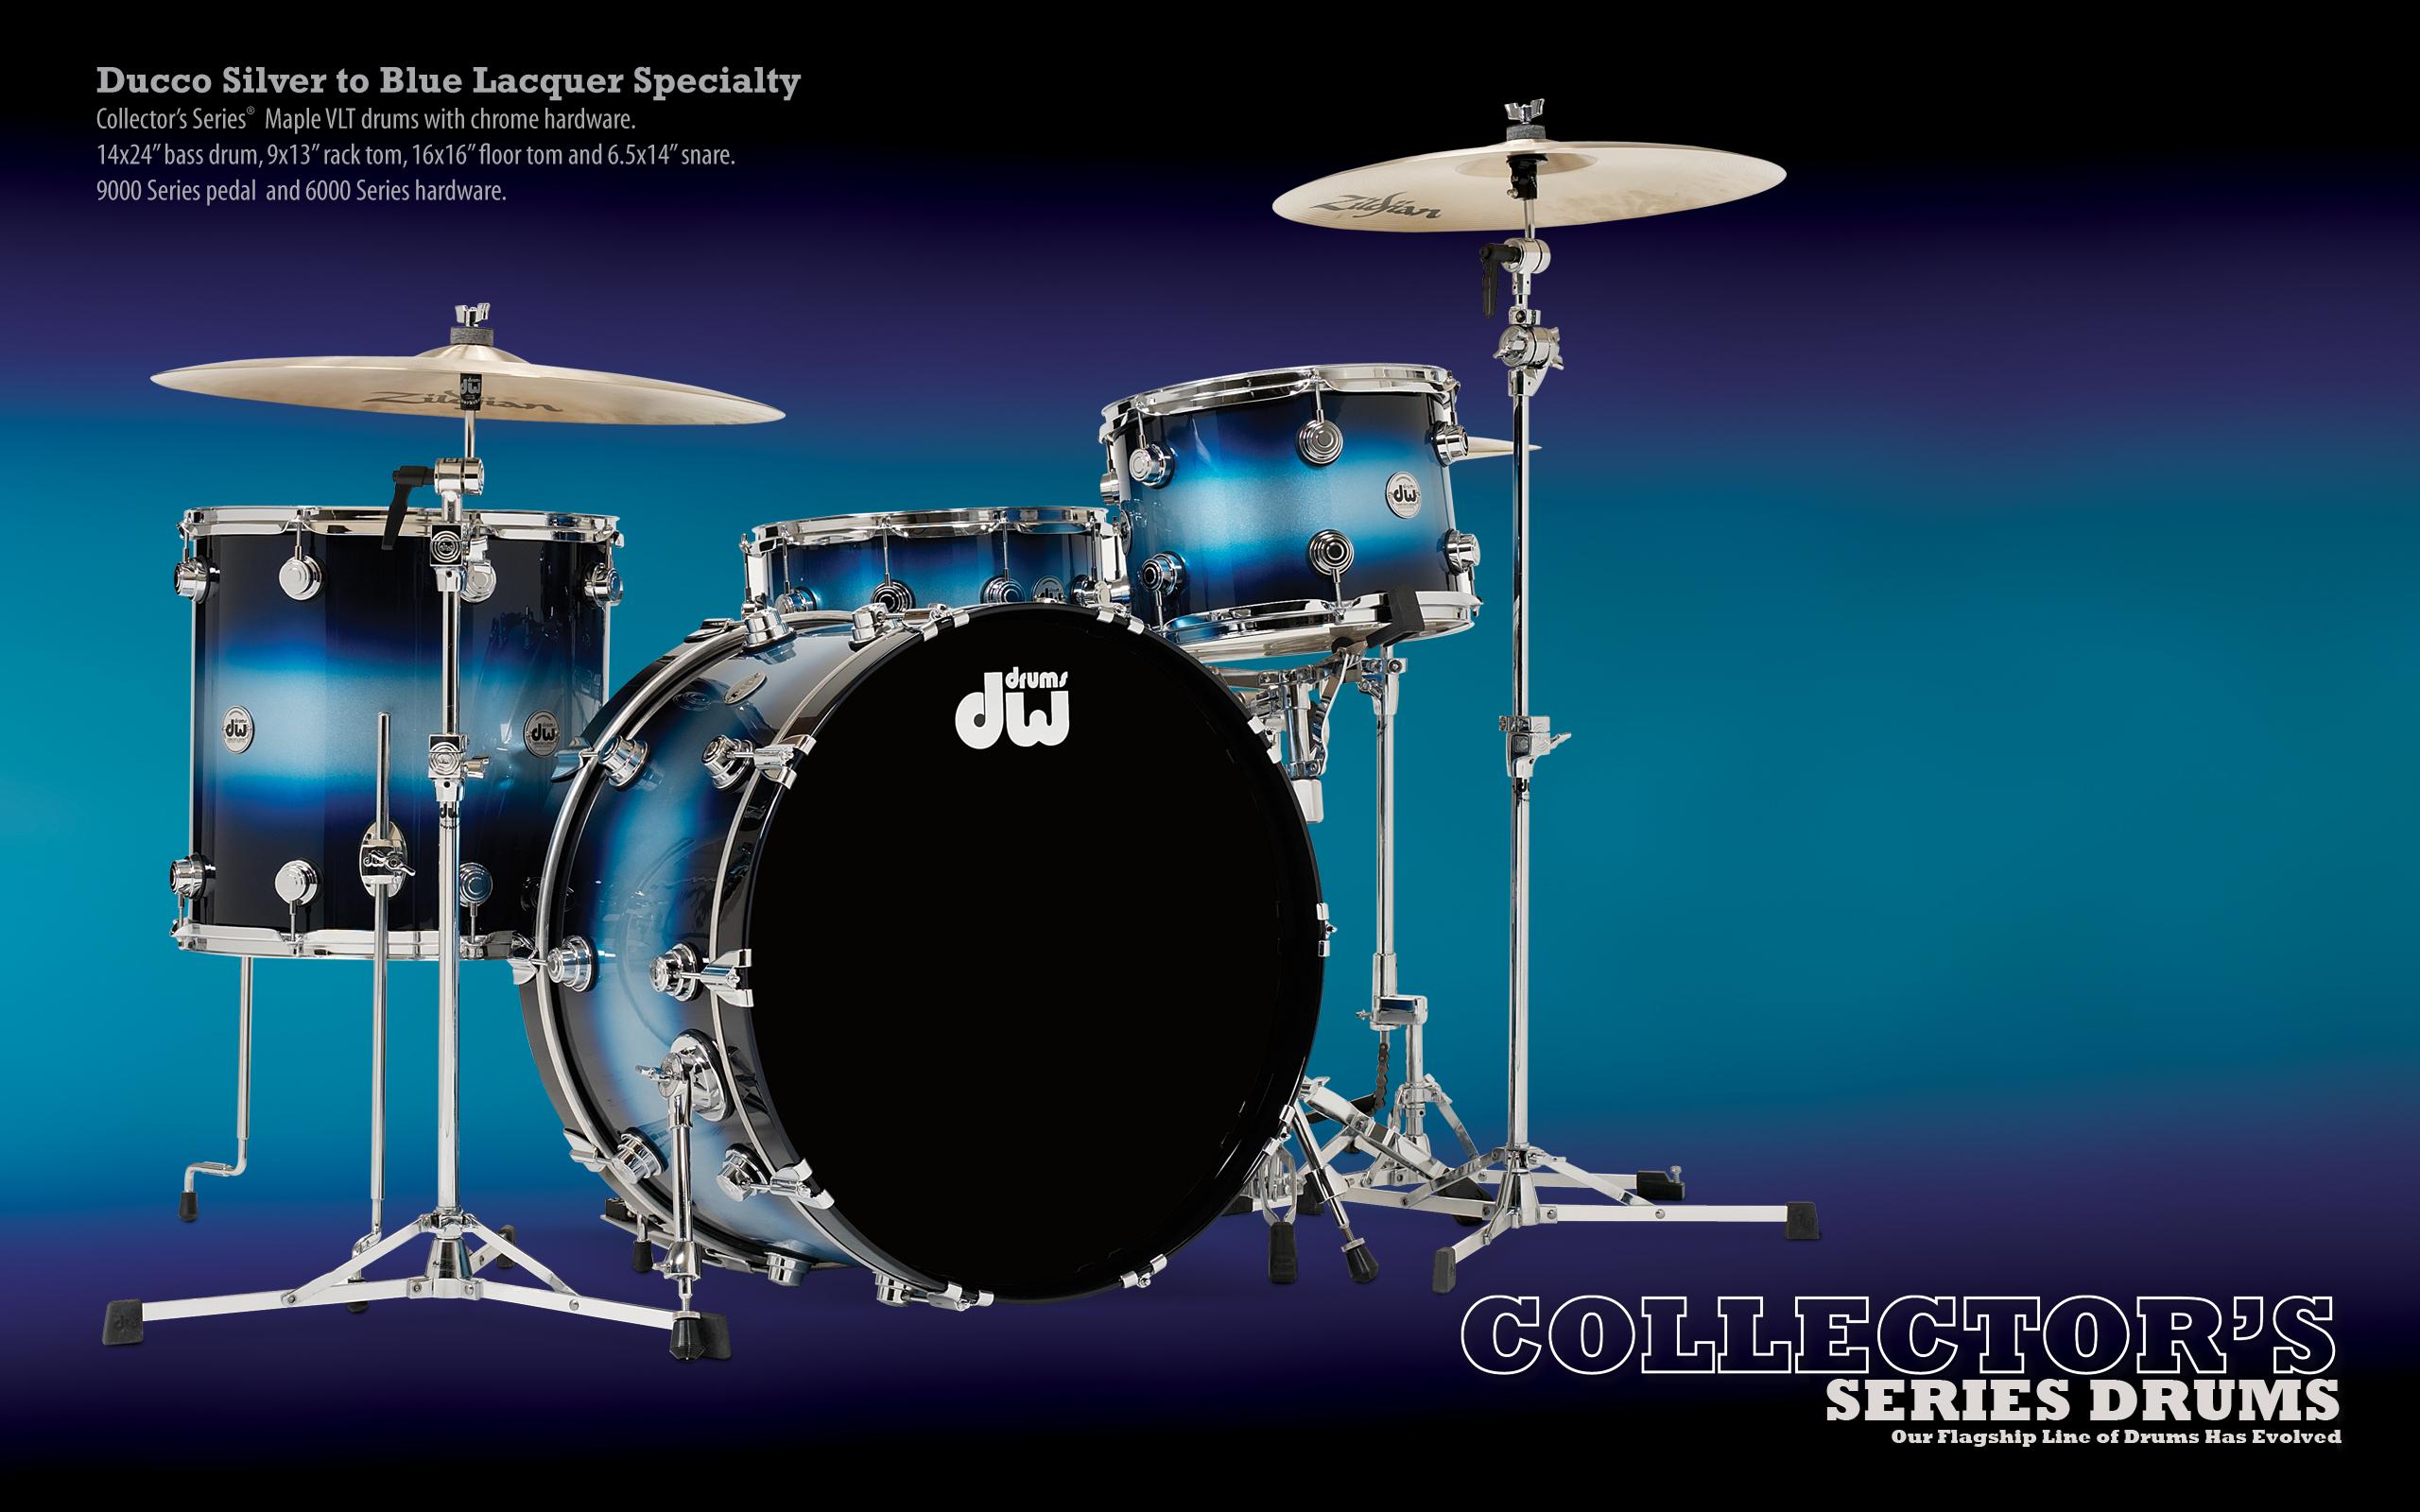 d09a9269 Free download Wallpaper Drum Workshop Inc drums pedals hardware dvds ...